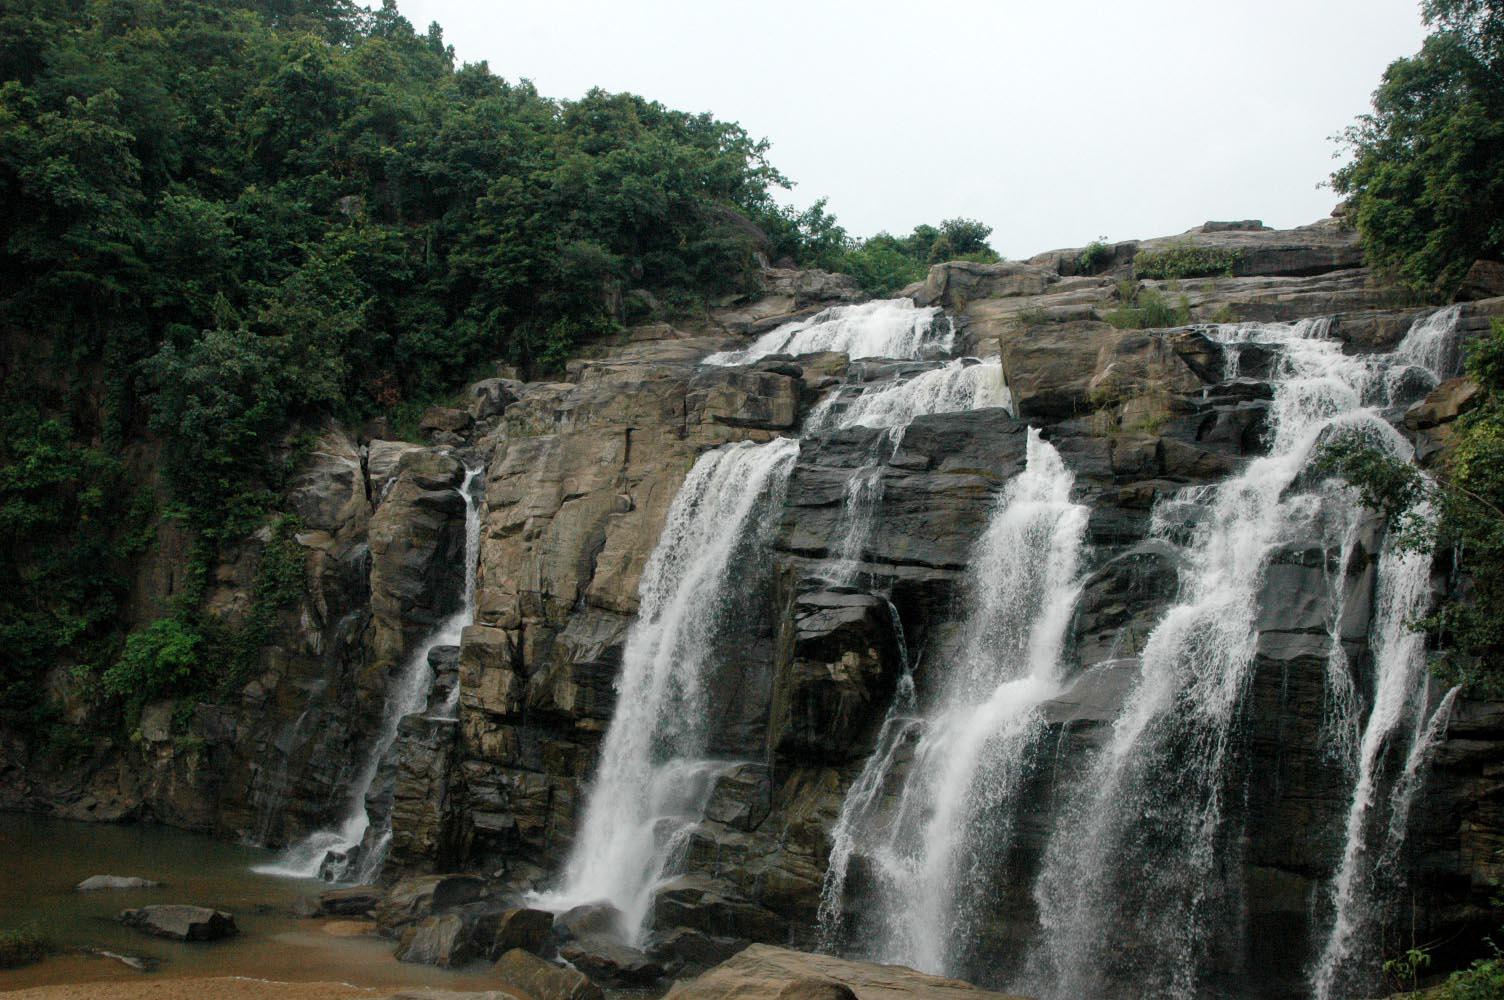 Lodh Waterfalls - Latehar Image